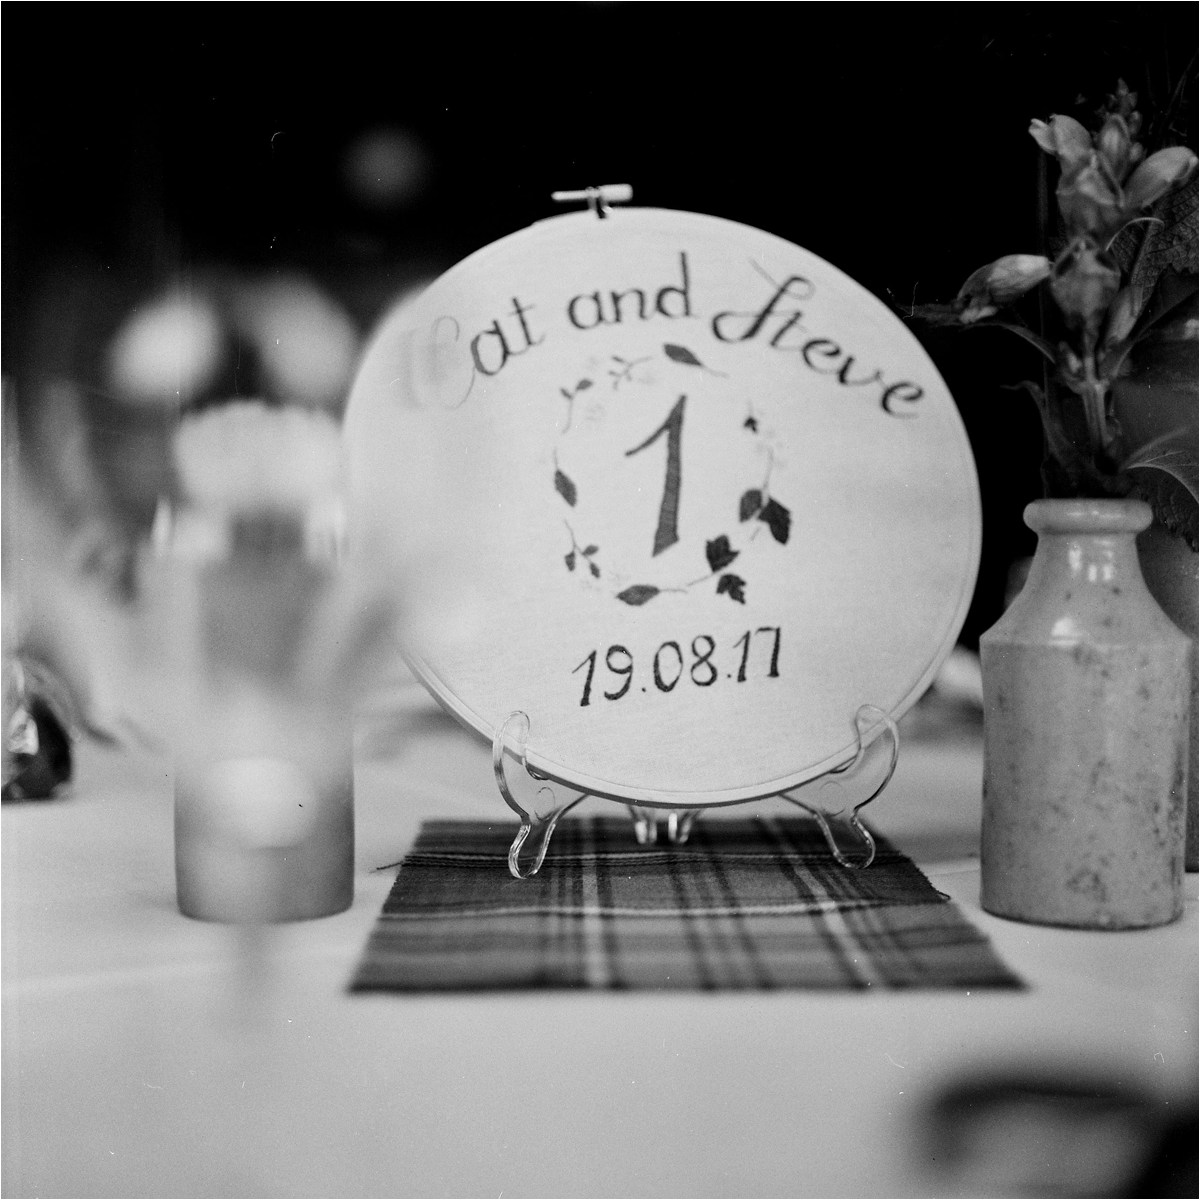 film photography, analogue weddings scotland, destination wedding photography scotland, Perthshire wedding inspiration, creative weddings, Cat & Steven's wedding, Errol Park Estate, photos by Zoe,